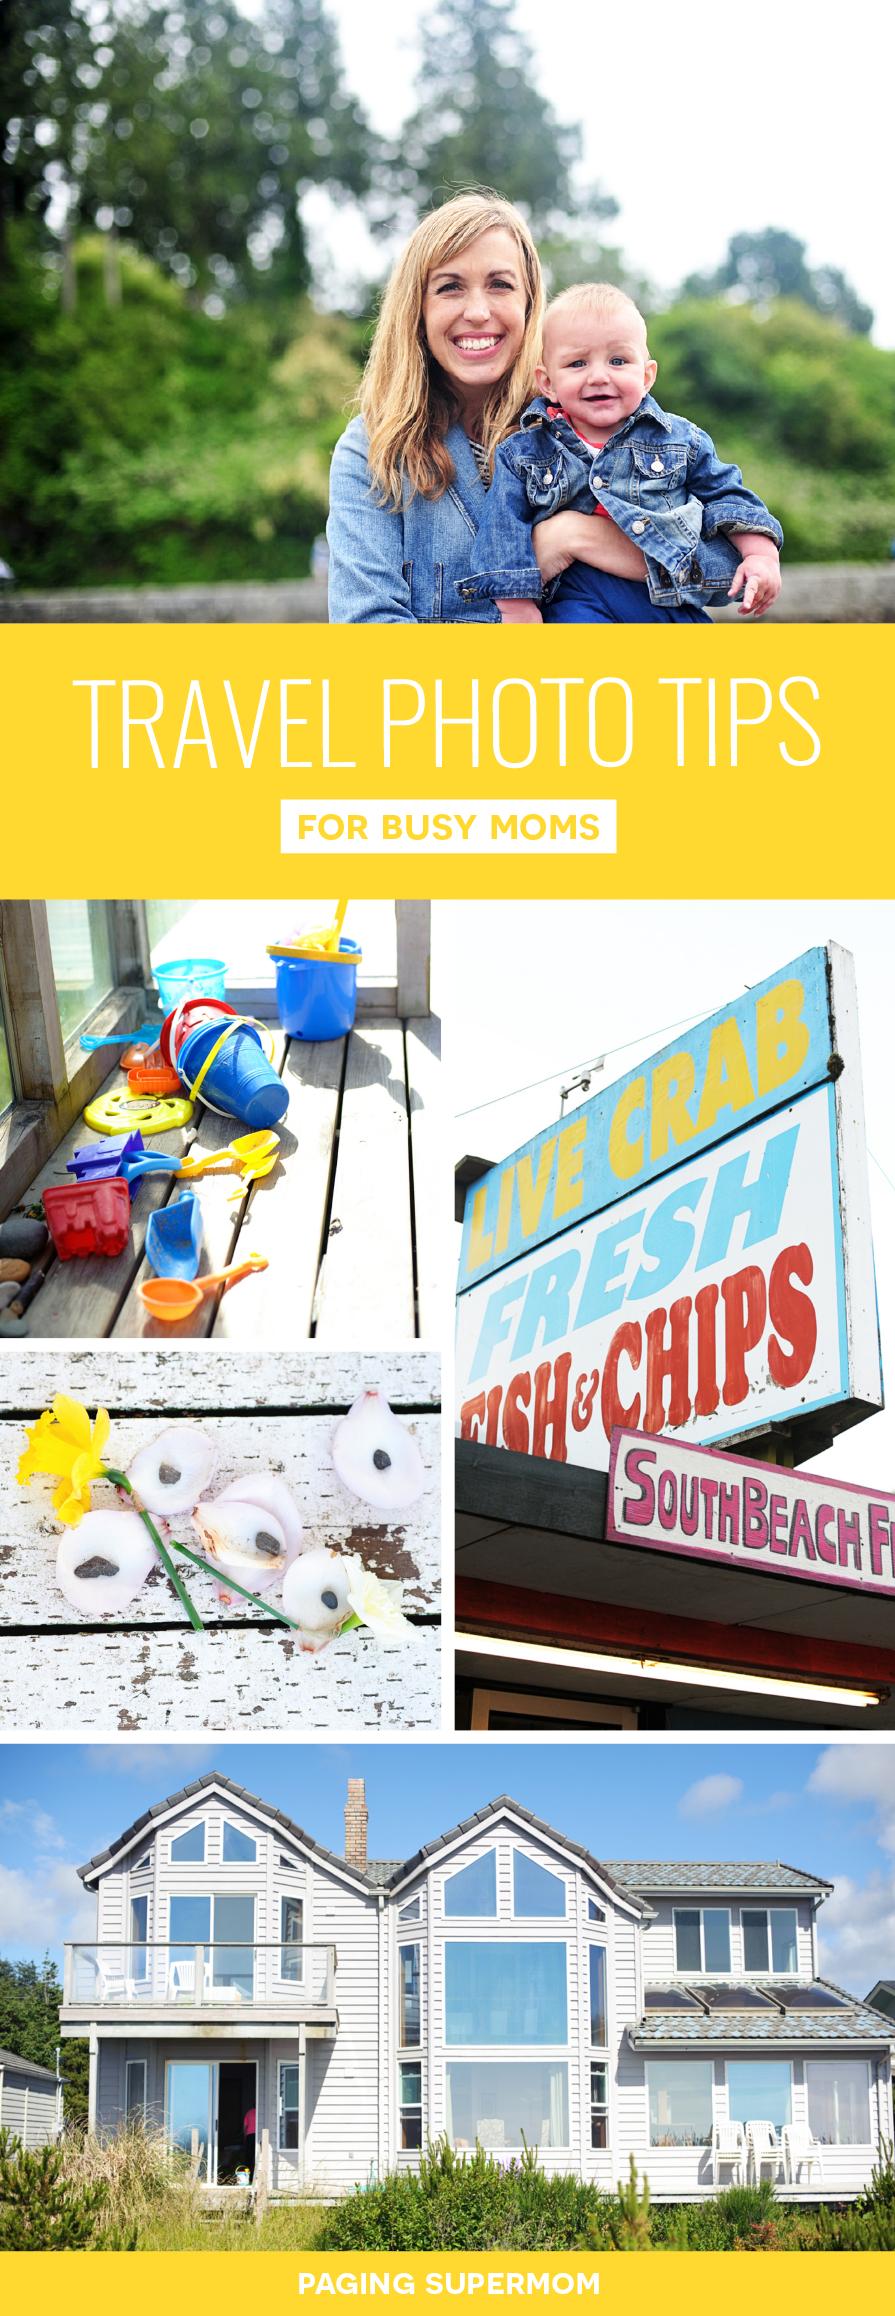 Travel Photo Tips for Busy Moms via @PagingSupermom